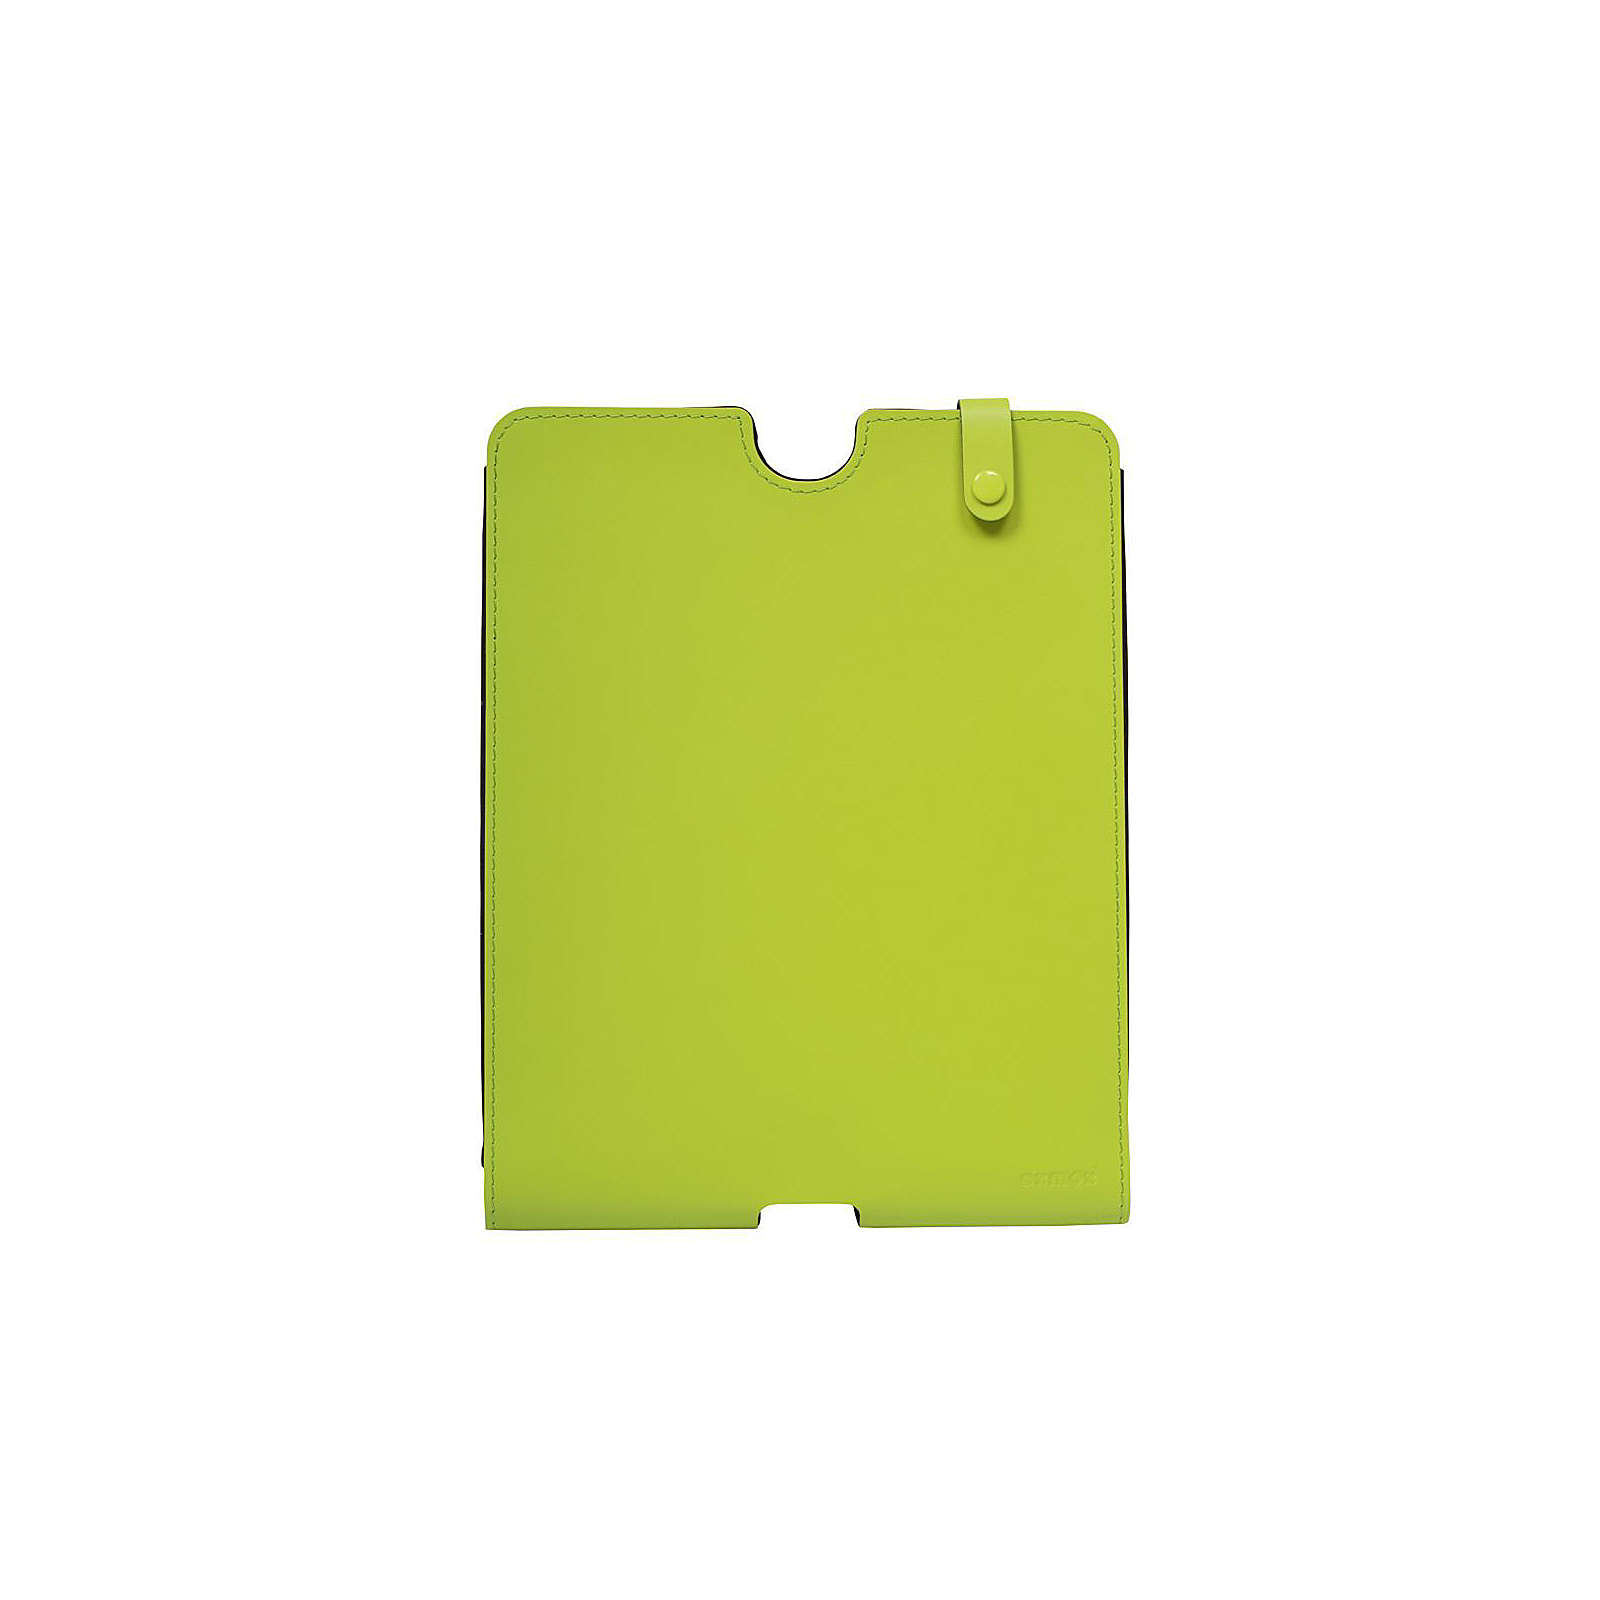 oxmox Pure IPad-Hüllen grau/grün